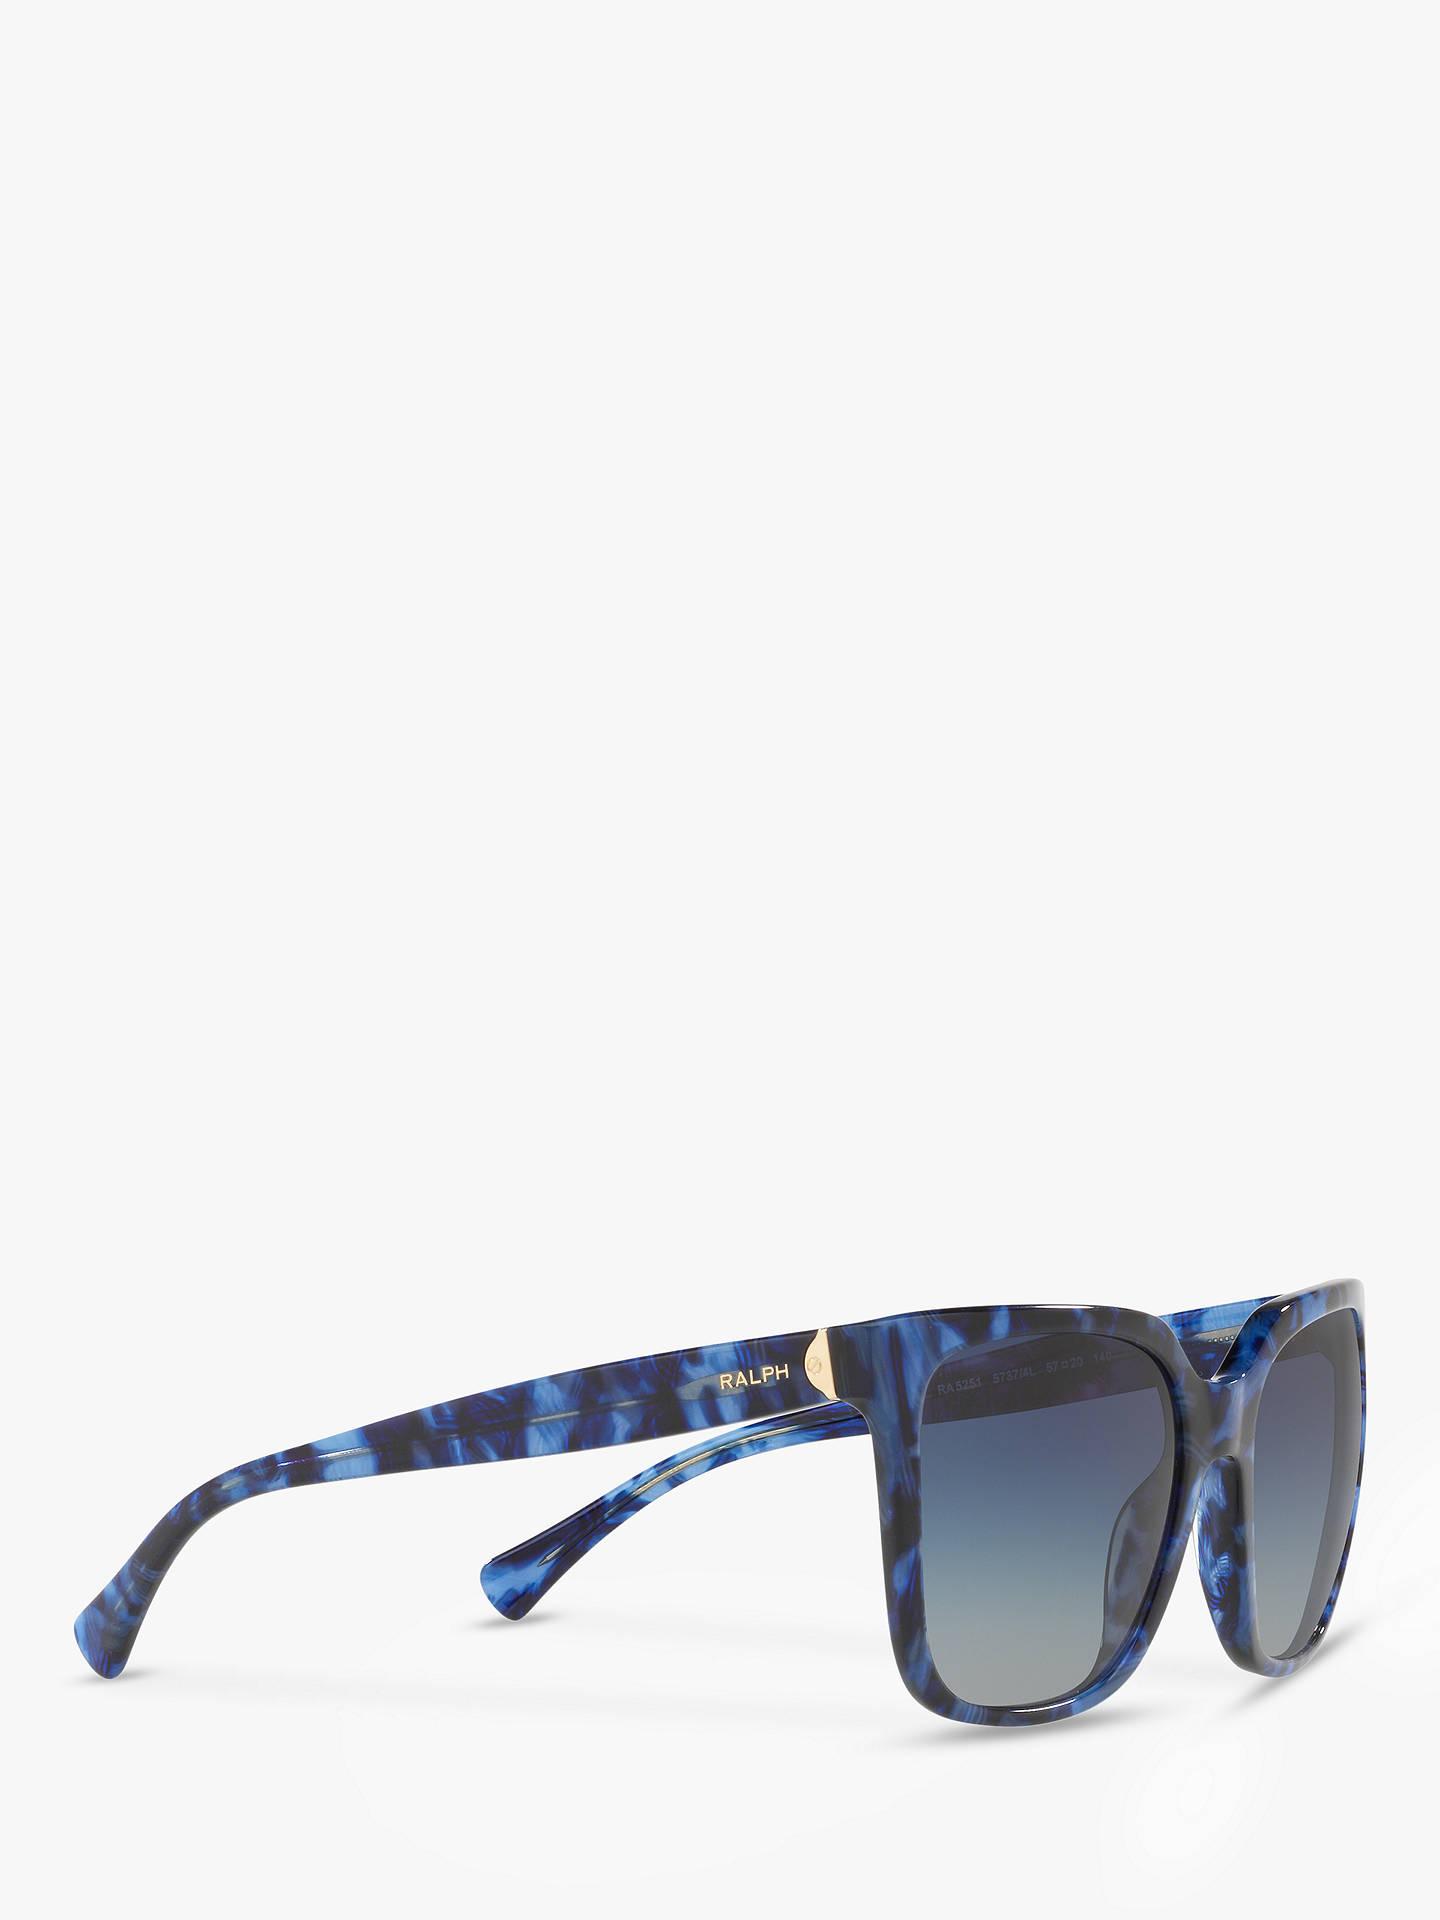 6707242e5551 ... Buy Polo Ralph Lauren RA5251 Women's Square Sunglasses, Blue  Marble/Grey Gradient Online at